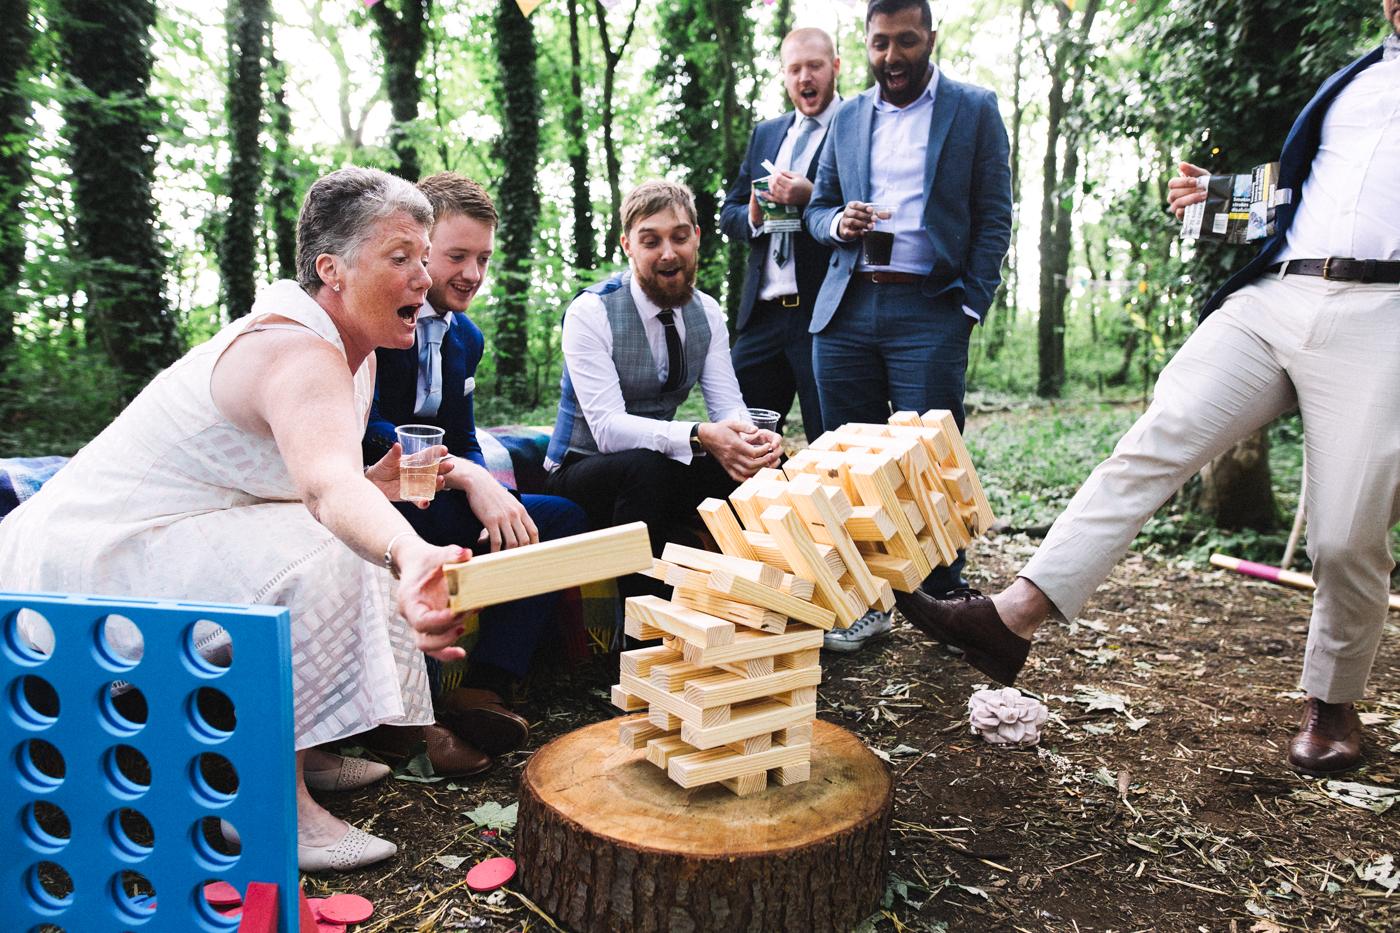 teesside-middlesbrough-north-east-wedding-photographer-creative-wedding-venues-0020.jpg